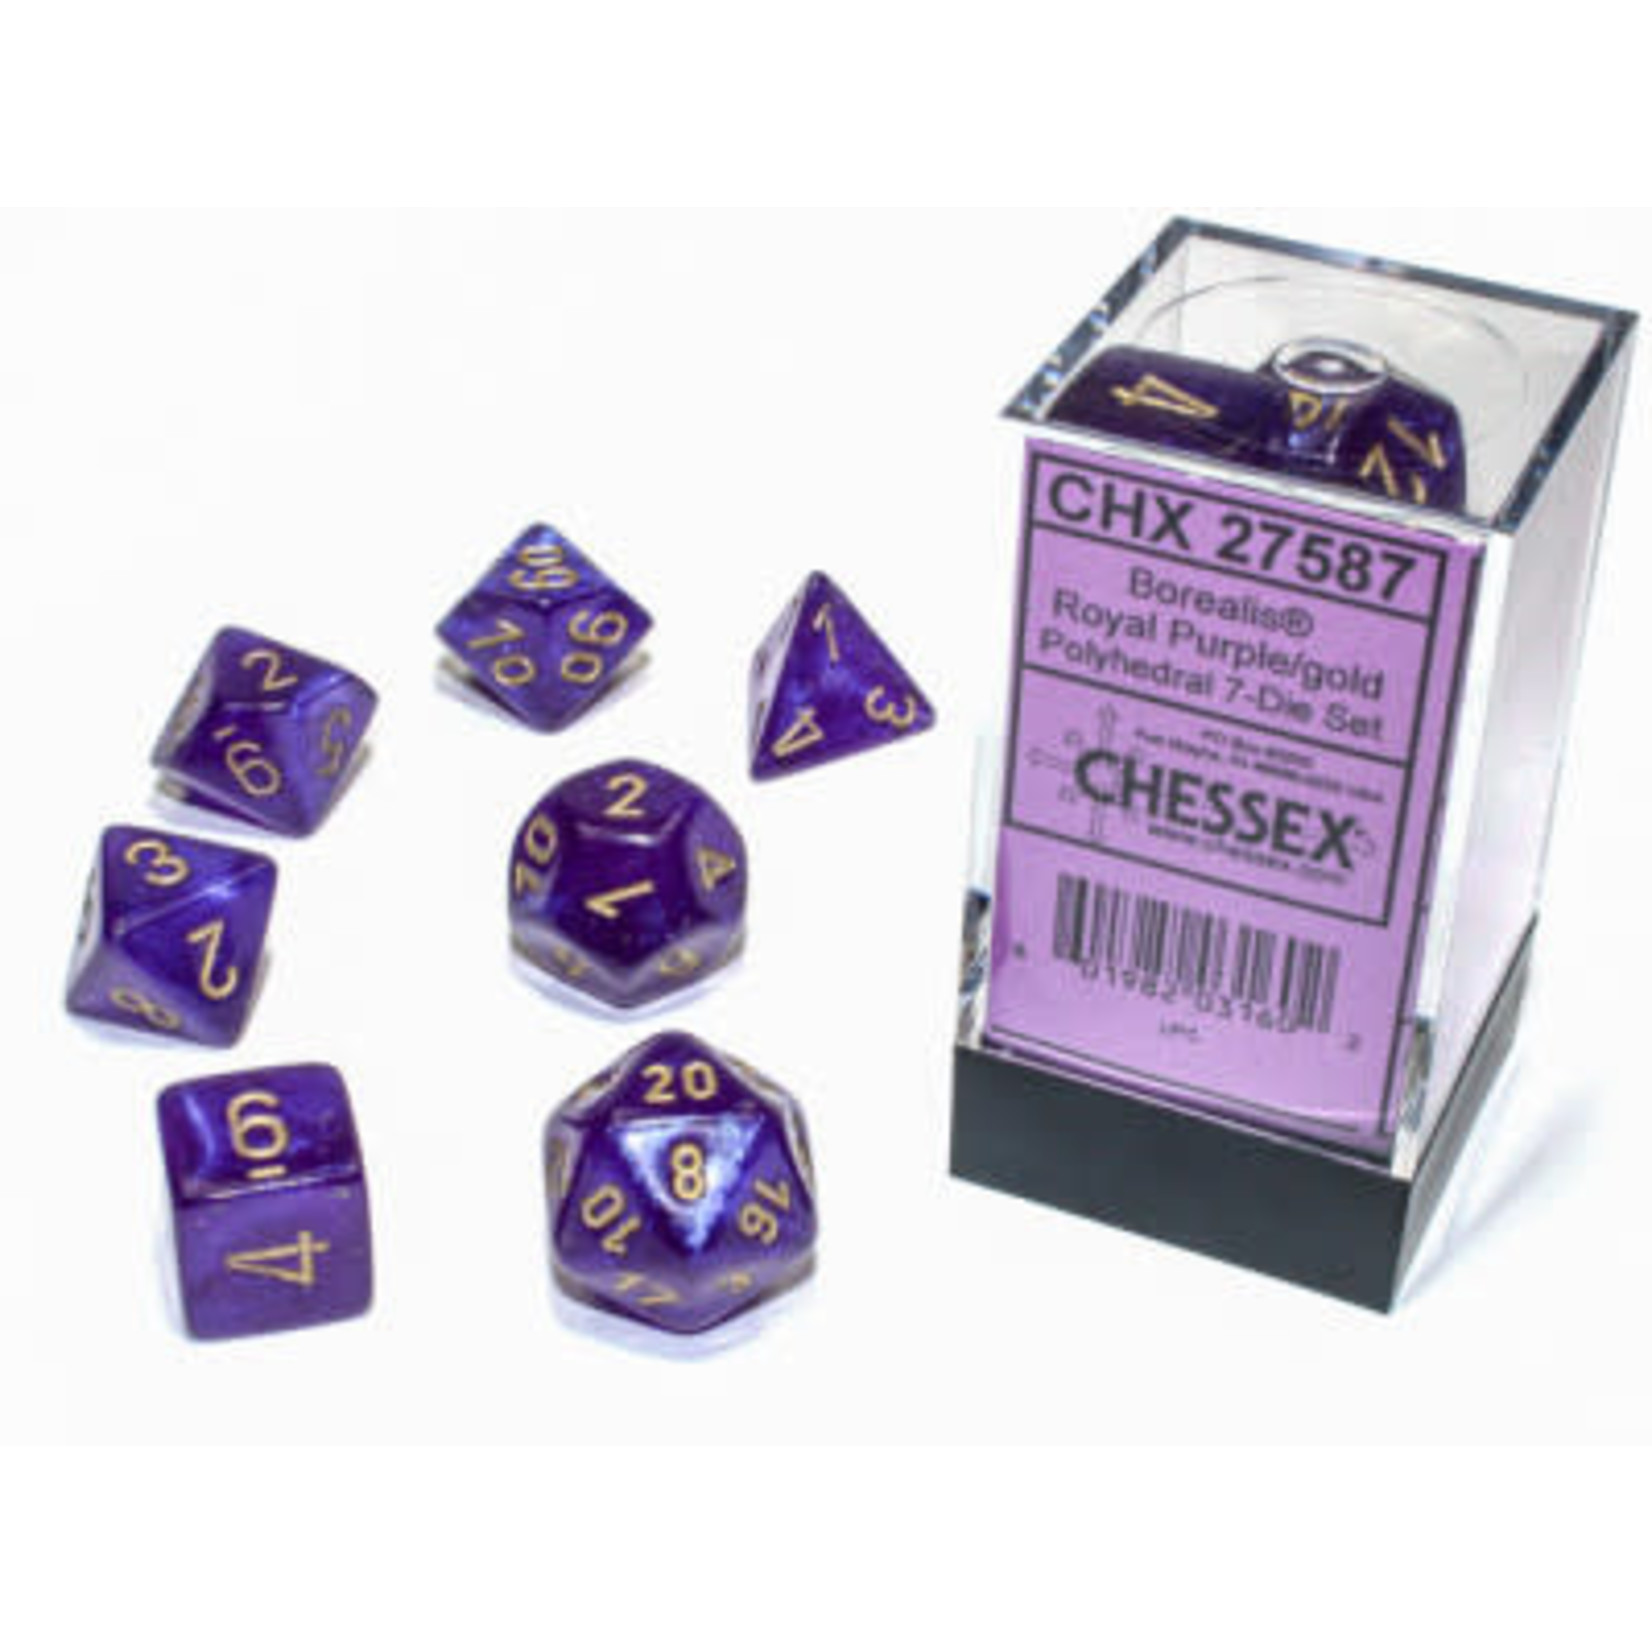 Chessex Set 7D Poly Borealis Luminary Royal Purple/Gold